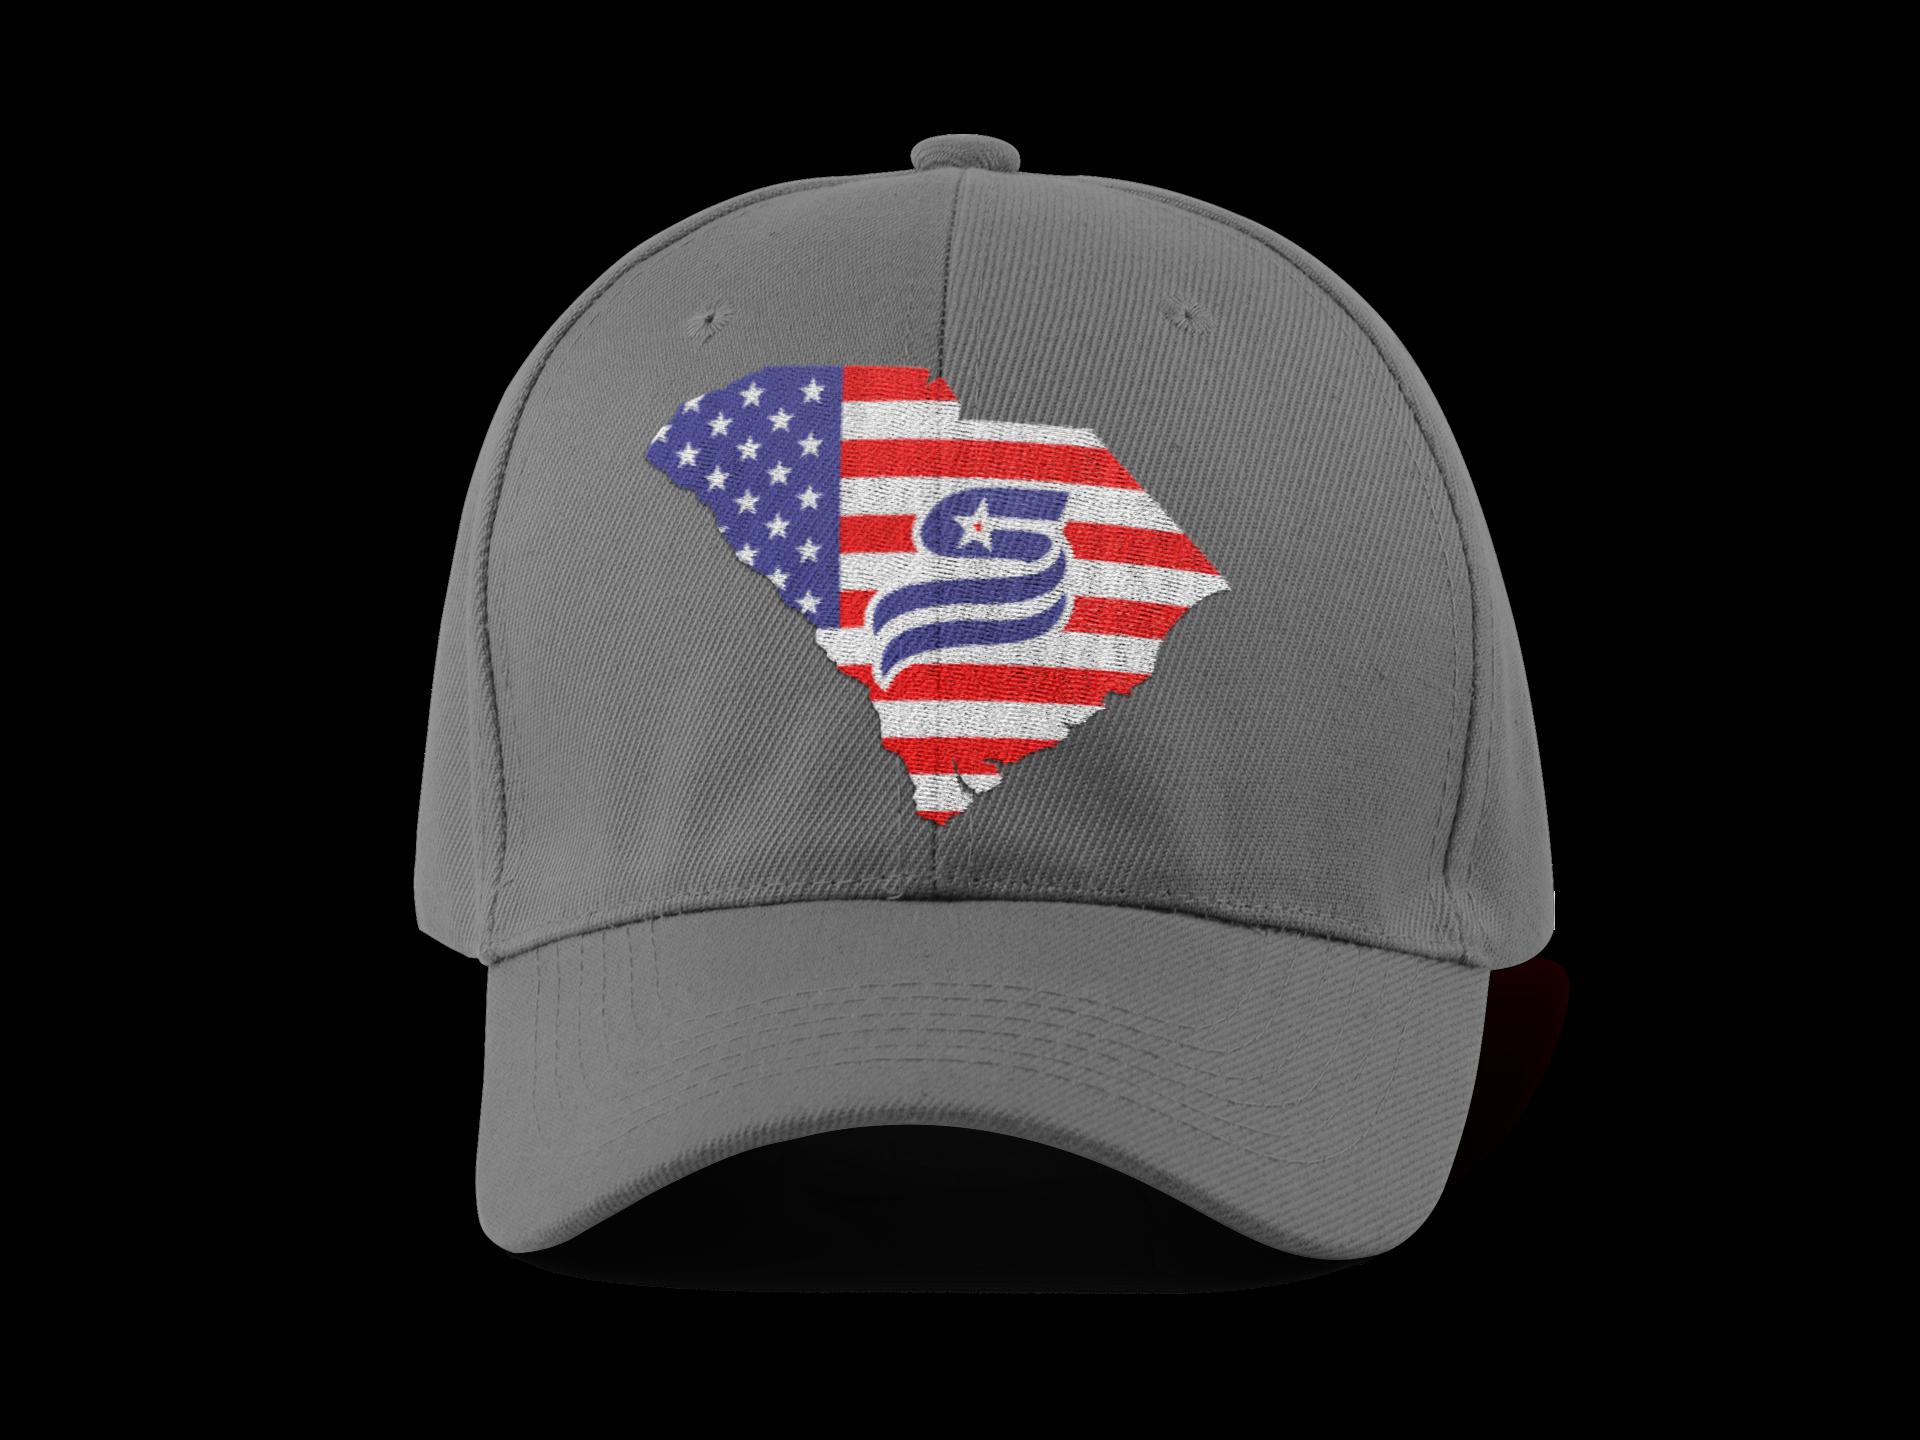 SC USSSA LOGO HAT